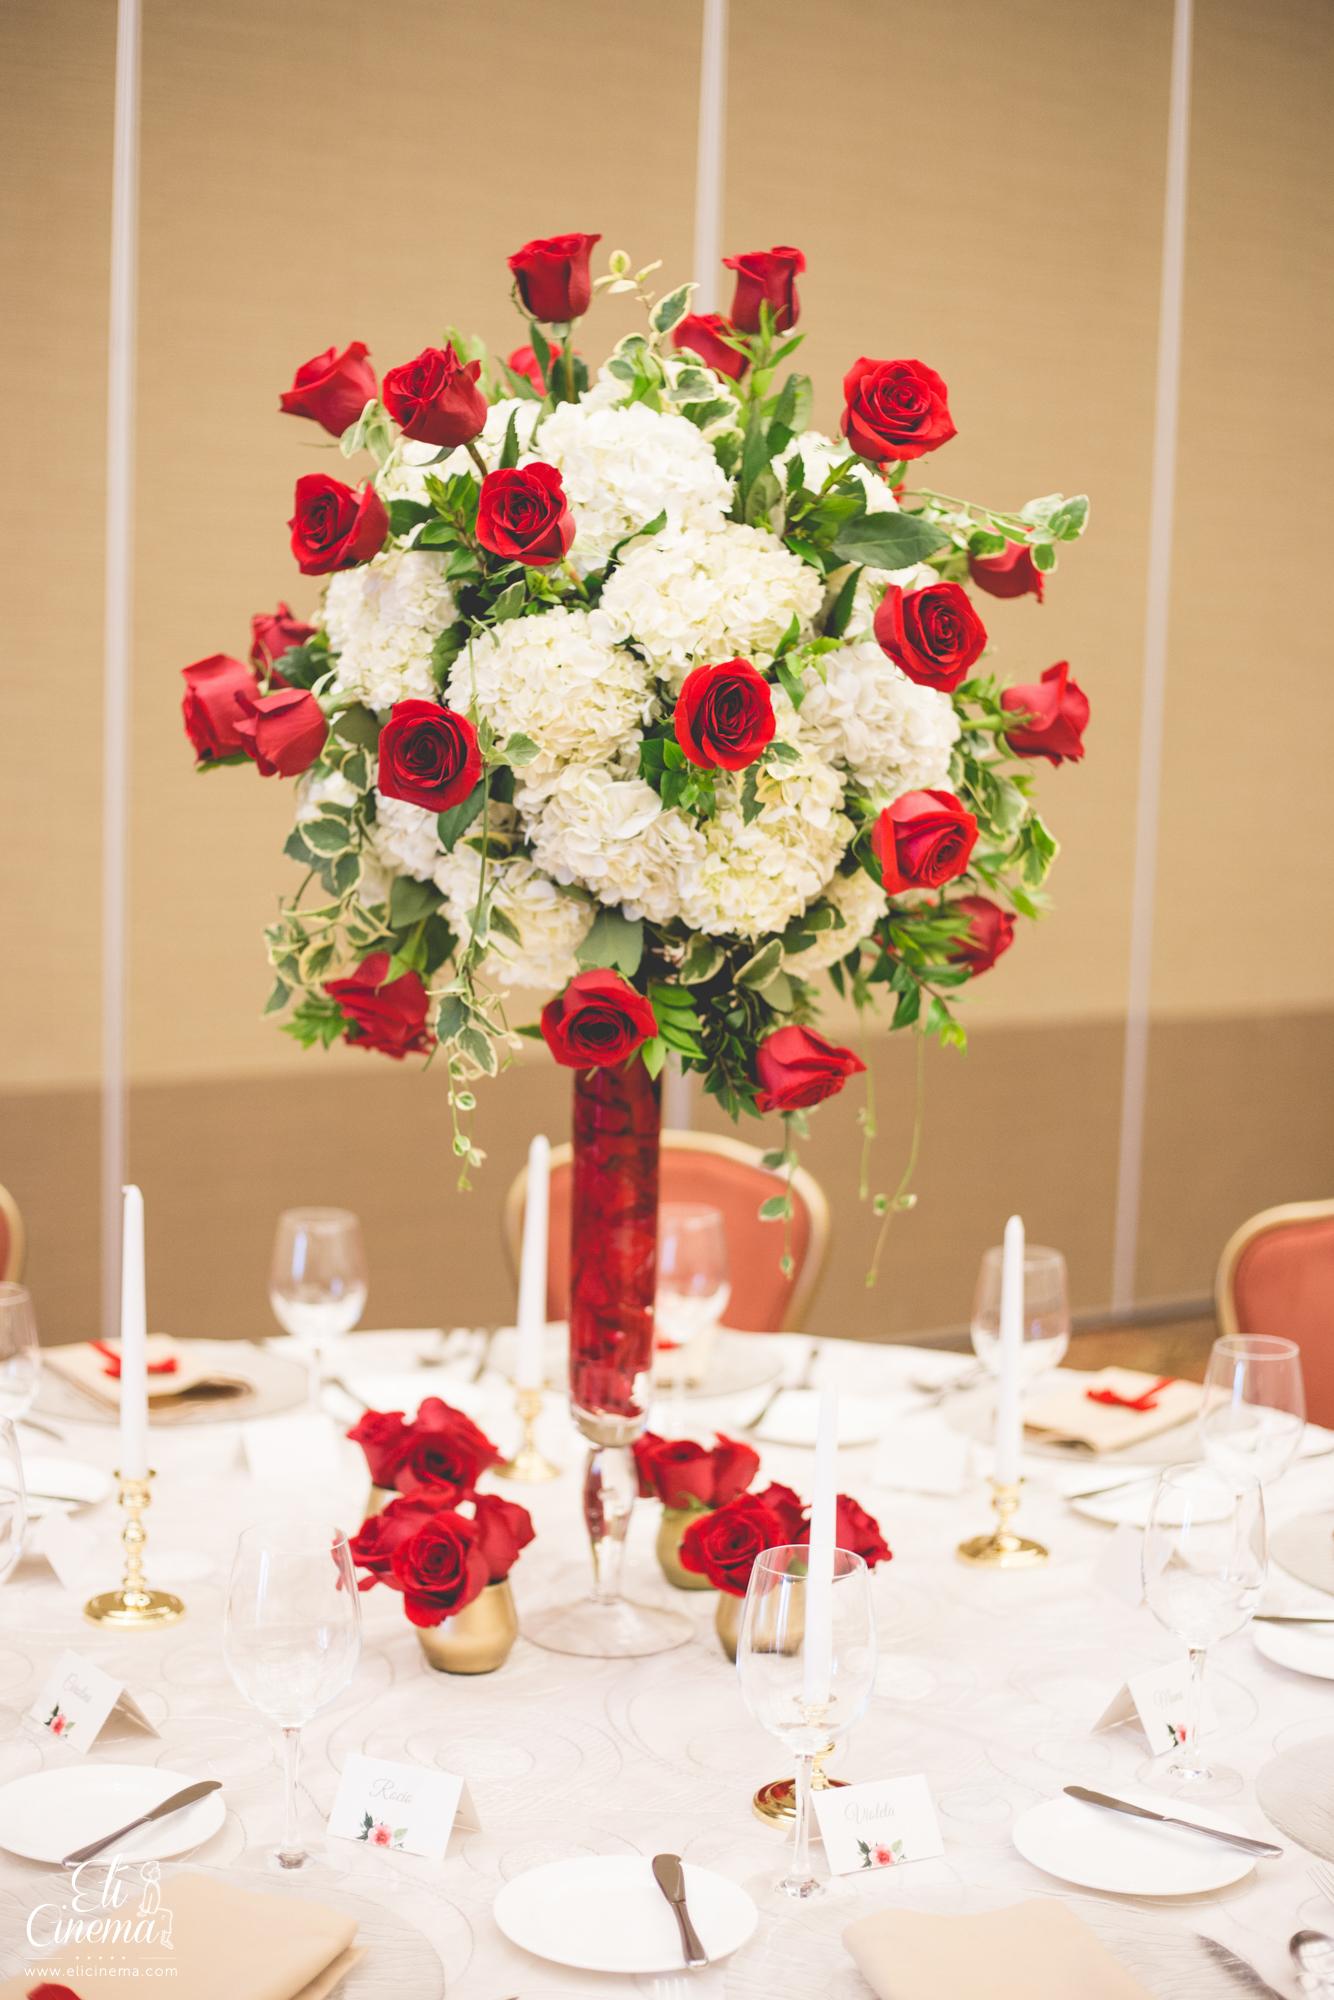 julieth-bravo-wedding-planner-decoracion-para-bodas-centros-de-mesa.jpg.jpg